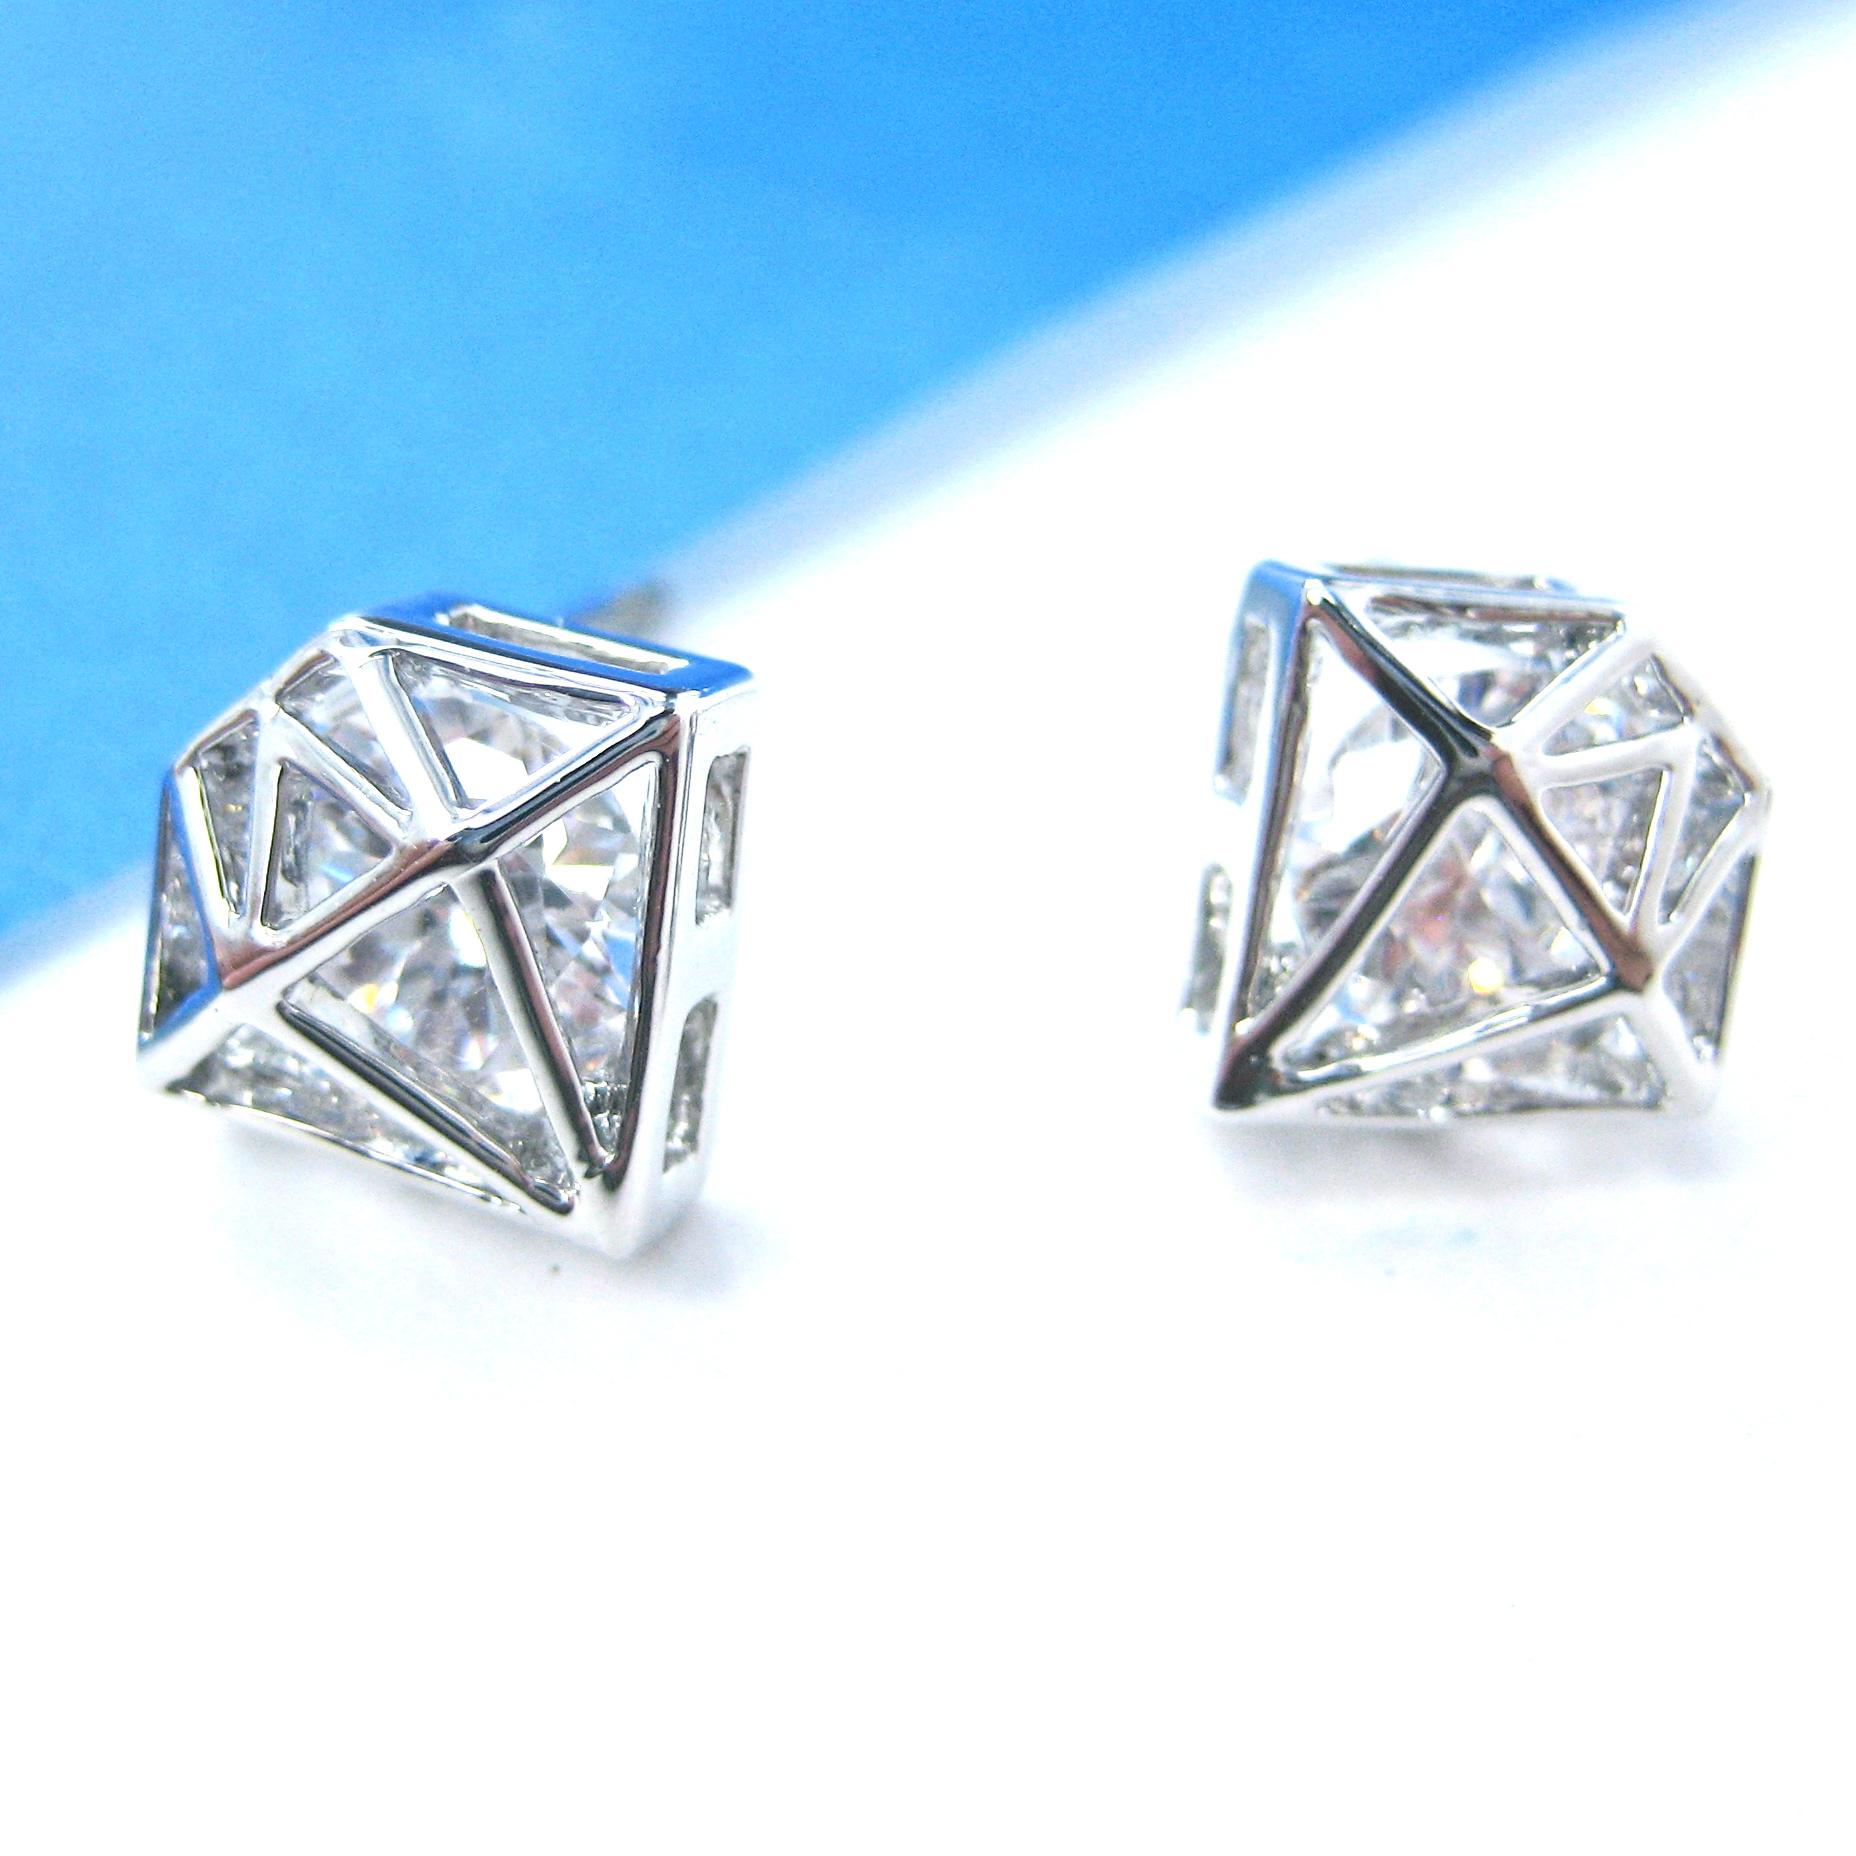 SMALL 3D Diamond Shaped Rhinestone Shiny Bling Stud